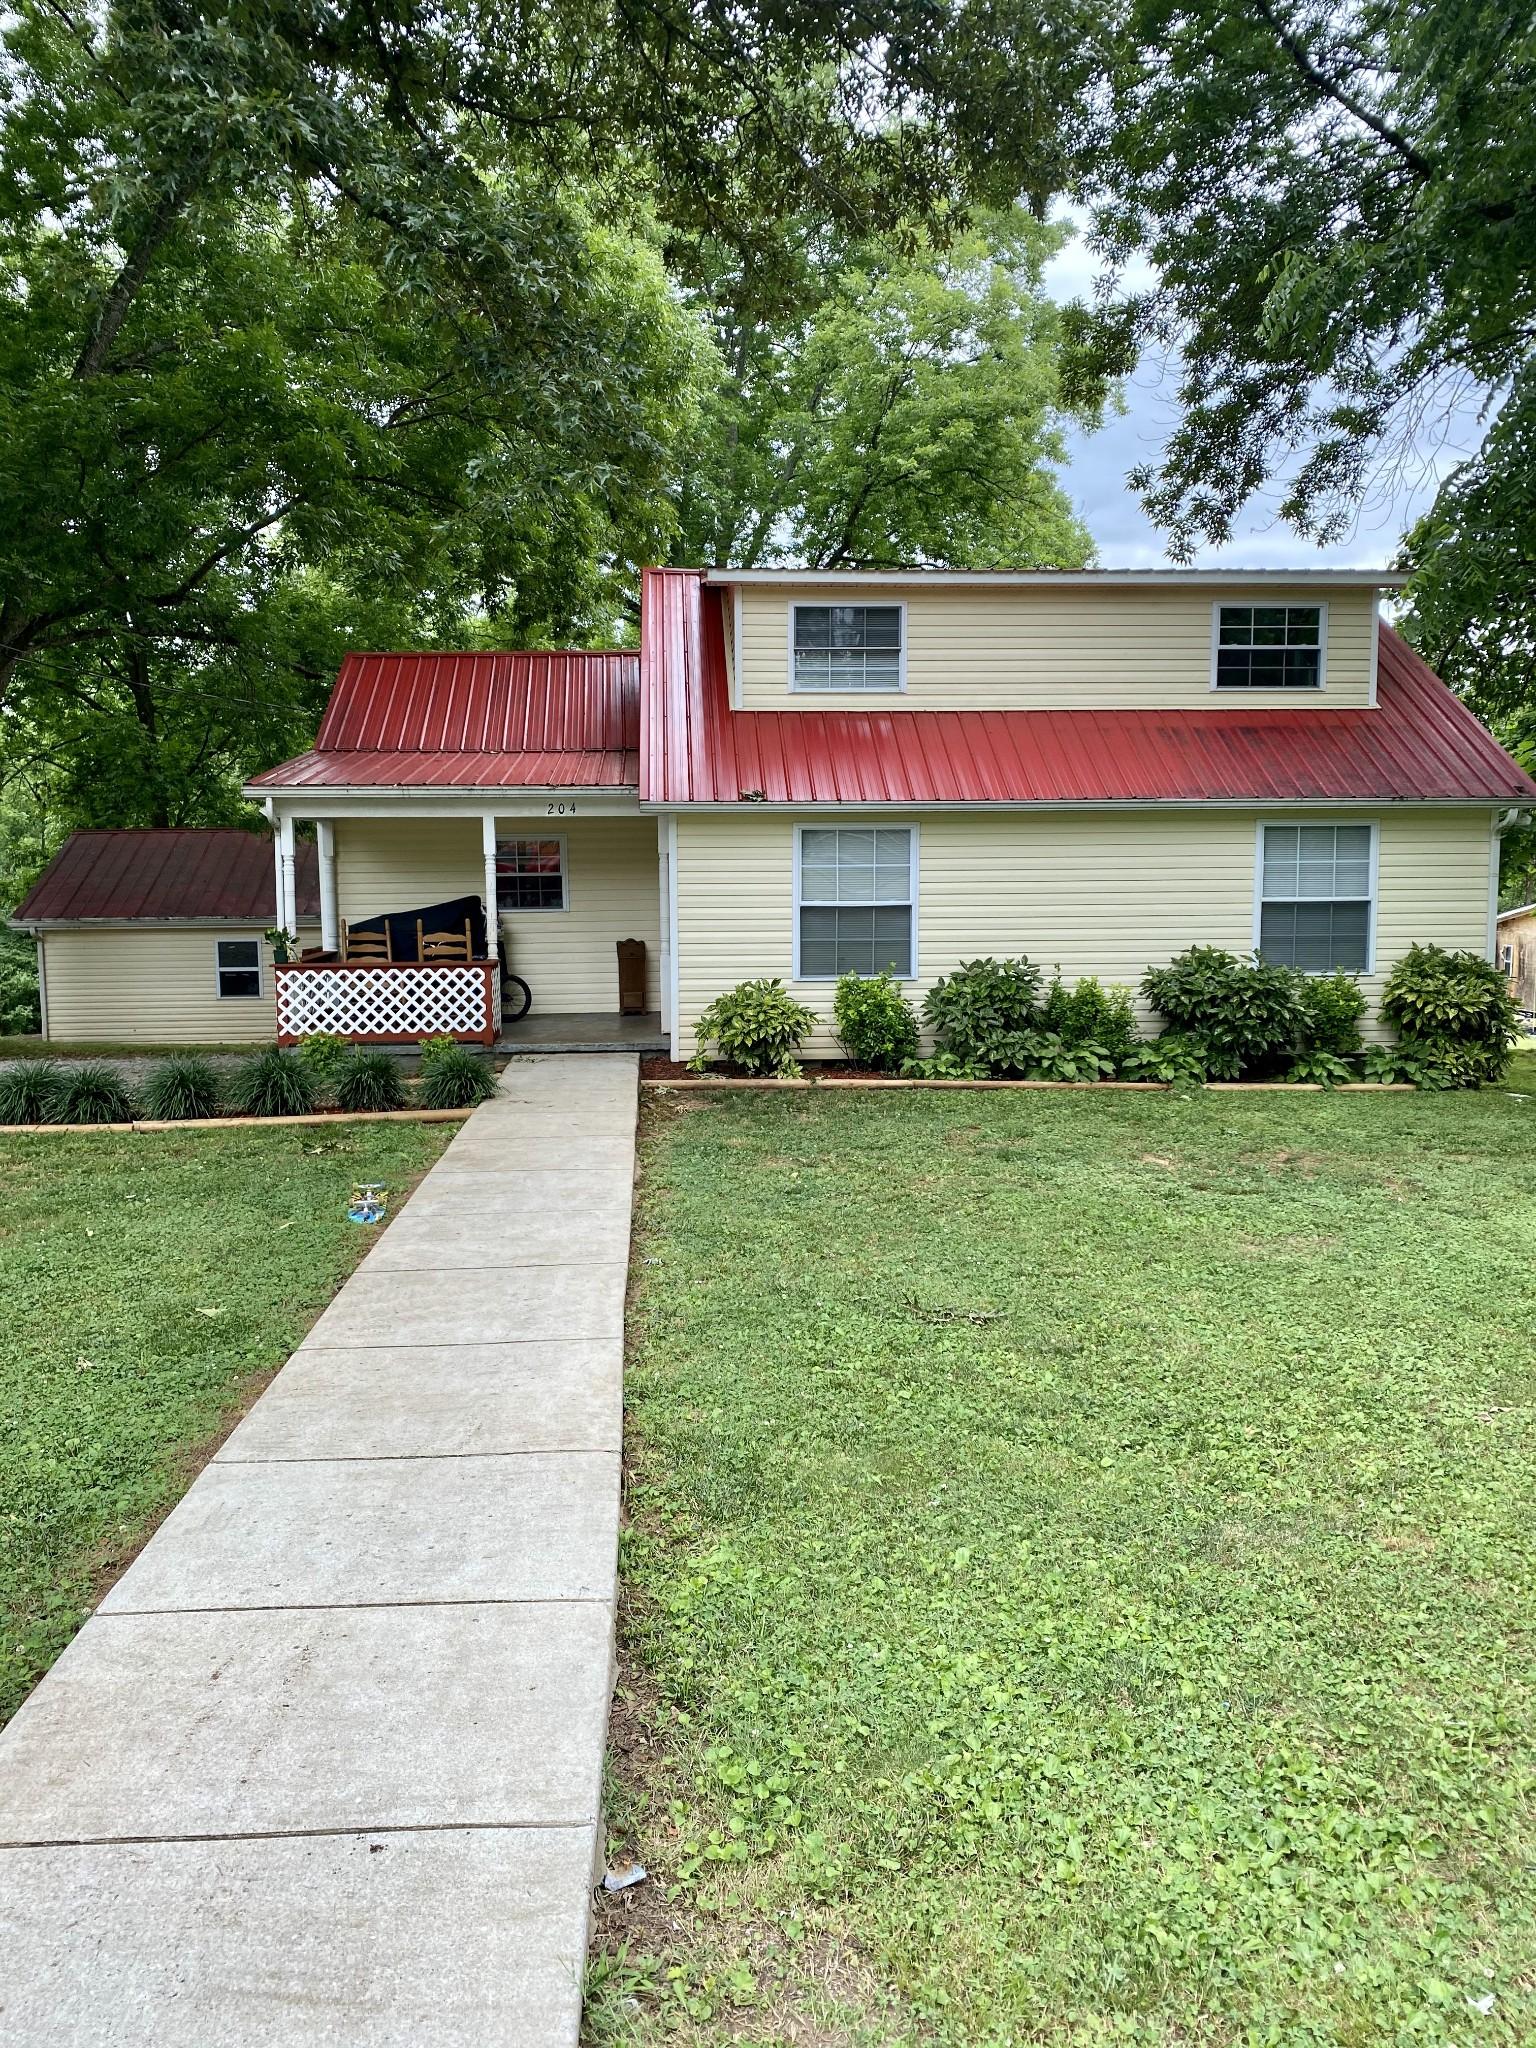 204 McClary St Property Photo - Decherd, TN real estate listing